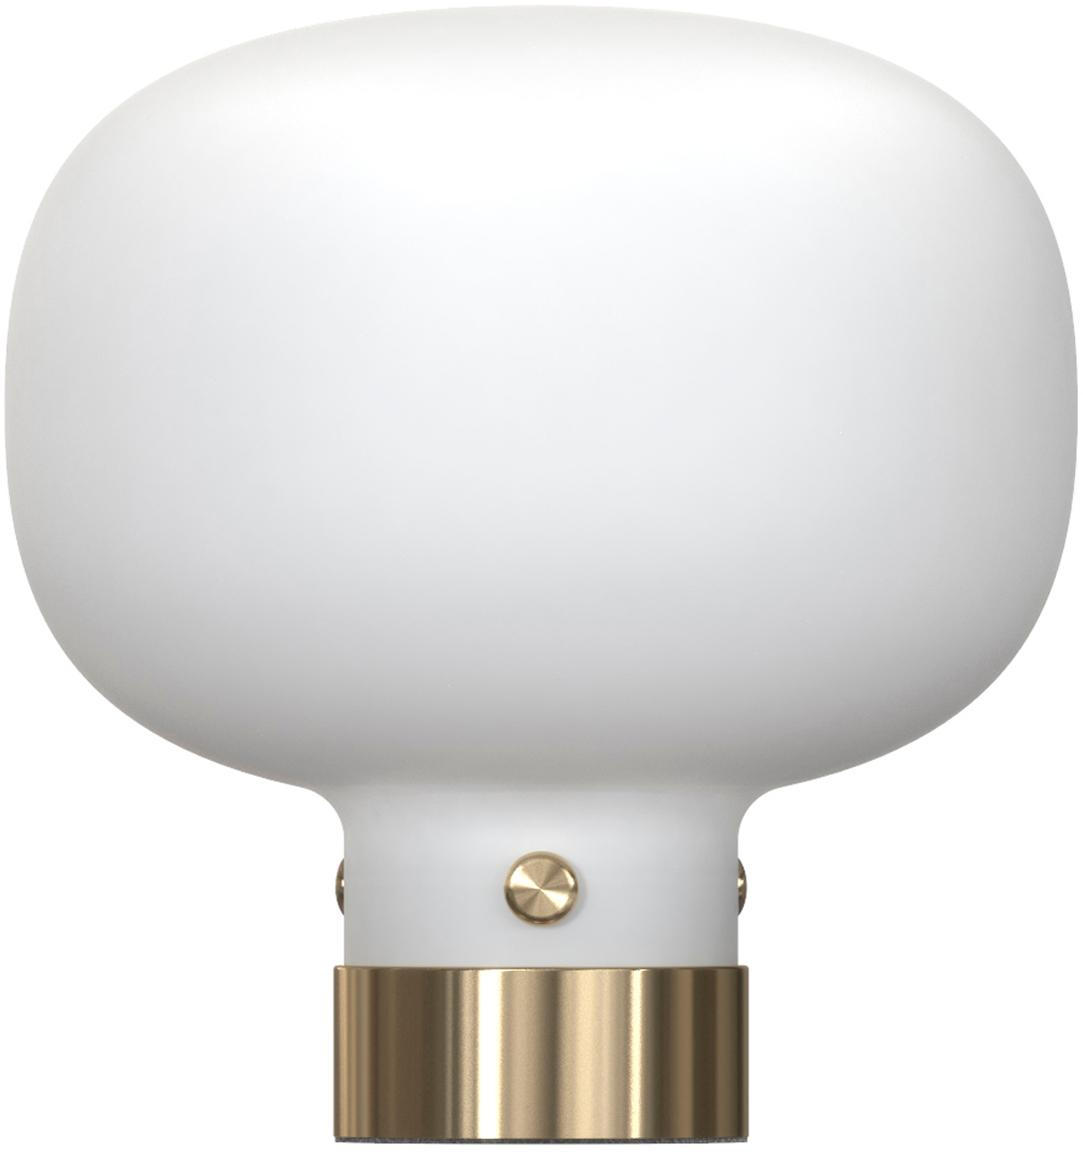 Tischlampe Raito aus Glas, Opalglas, Metall, Opalweiss, Messingfarben, Ø 20 x H 21 cm